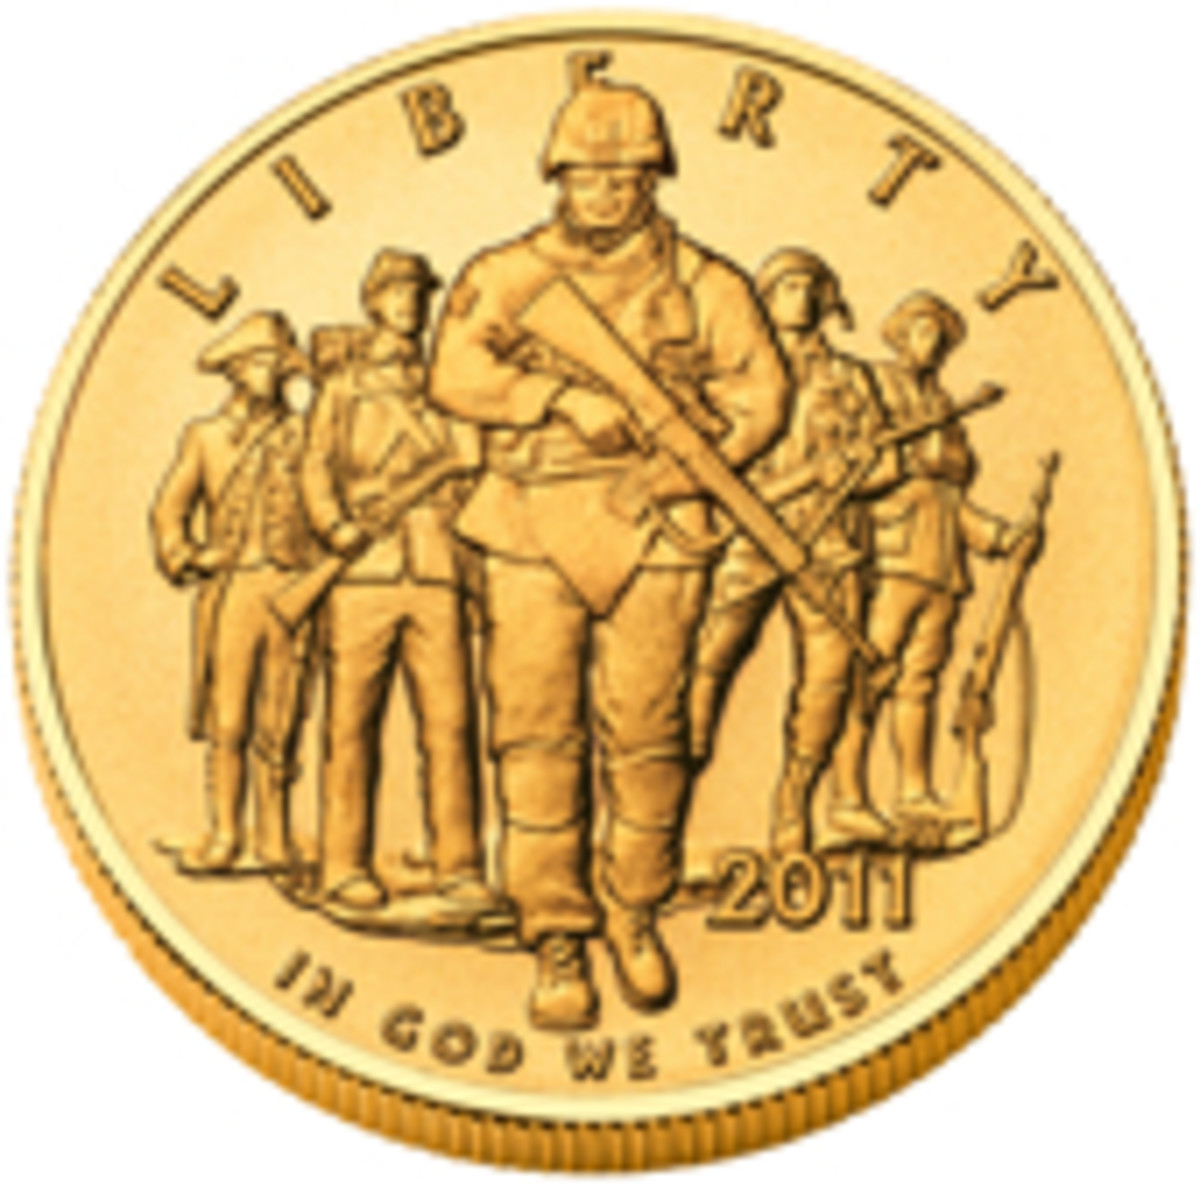 army commemorative coin